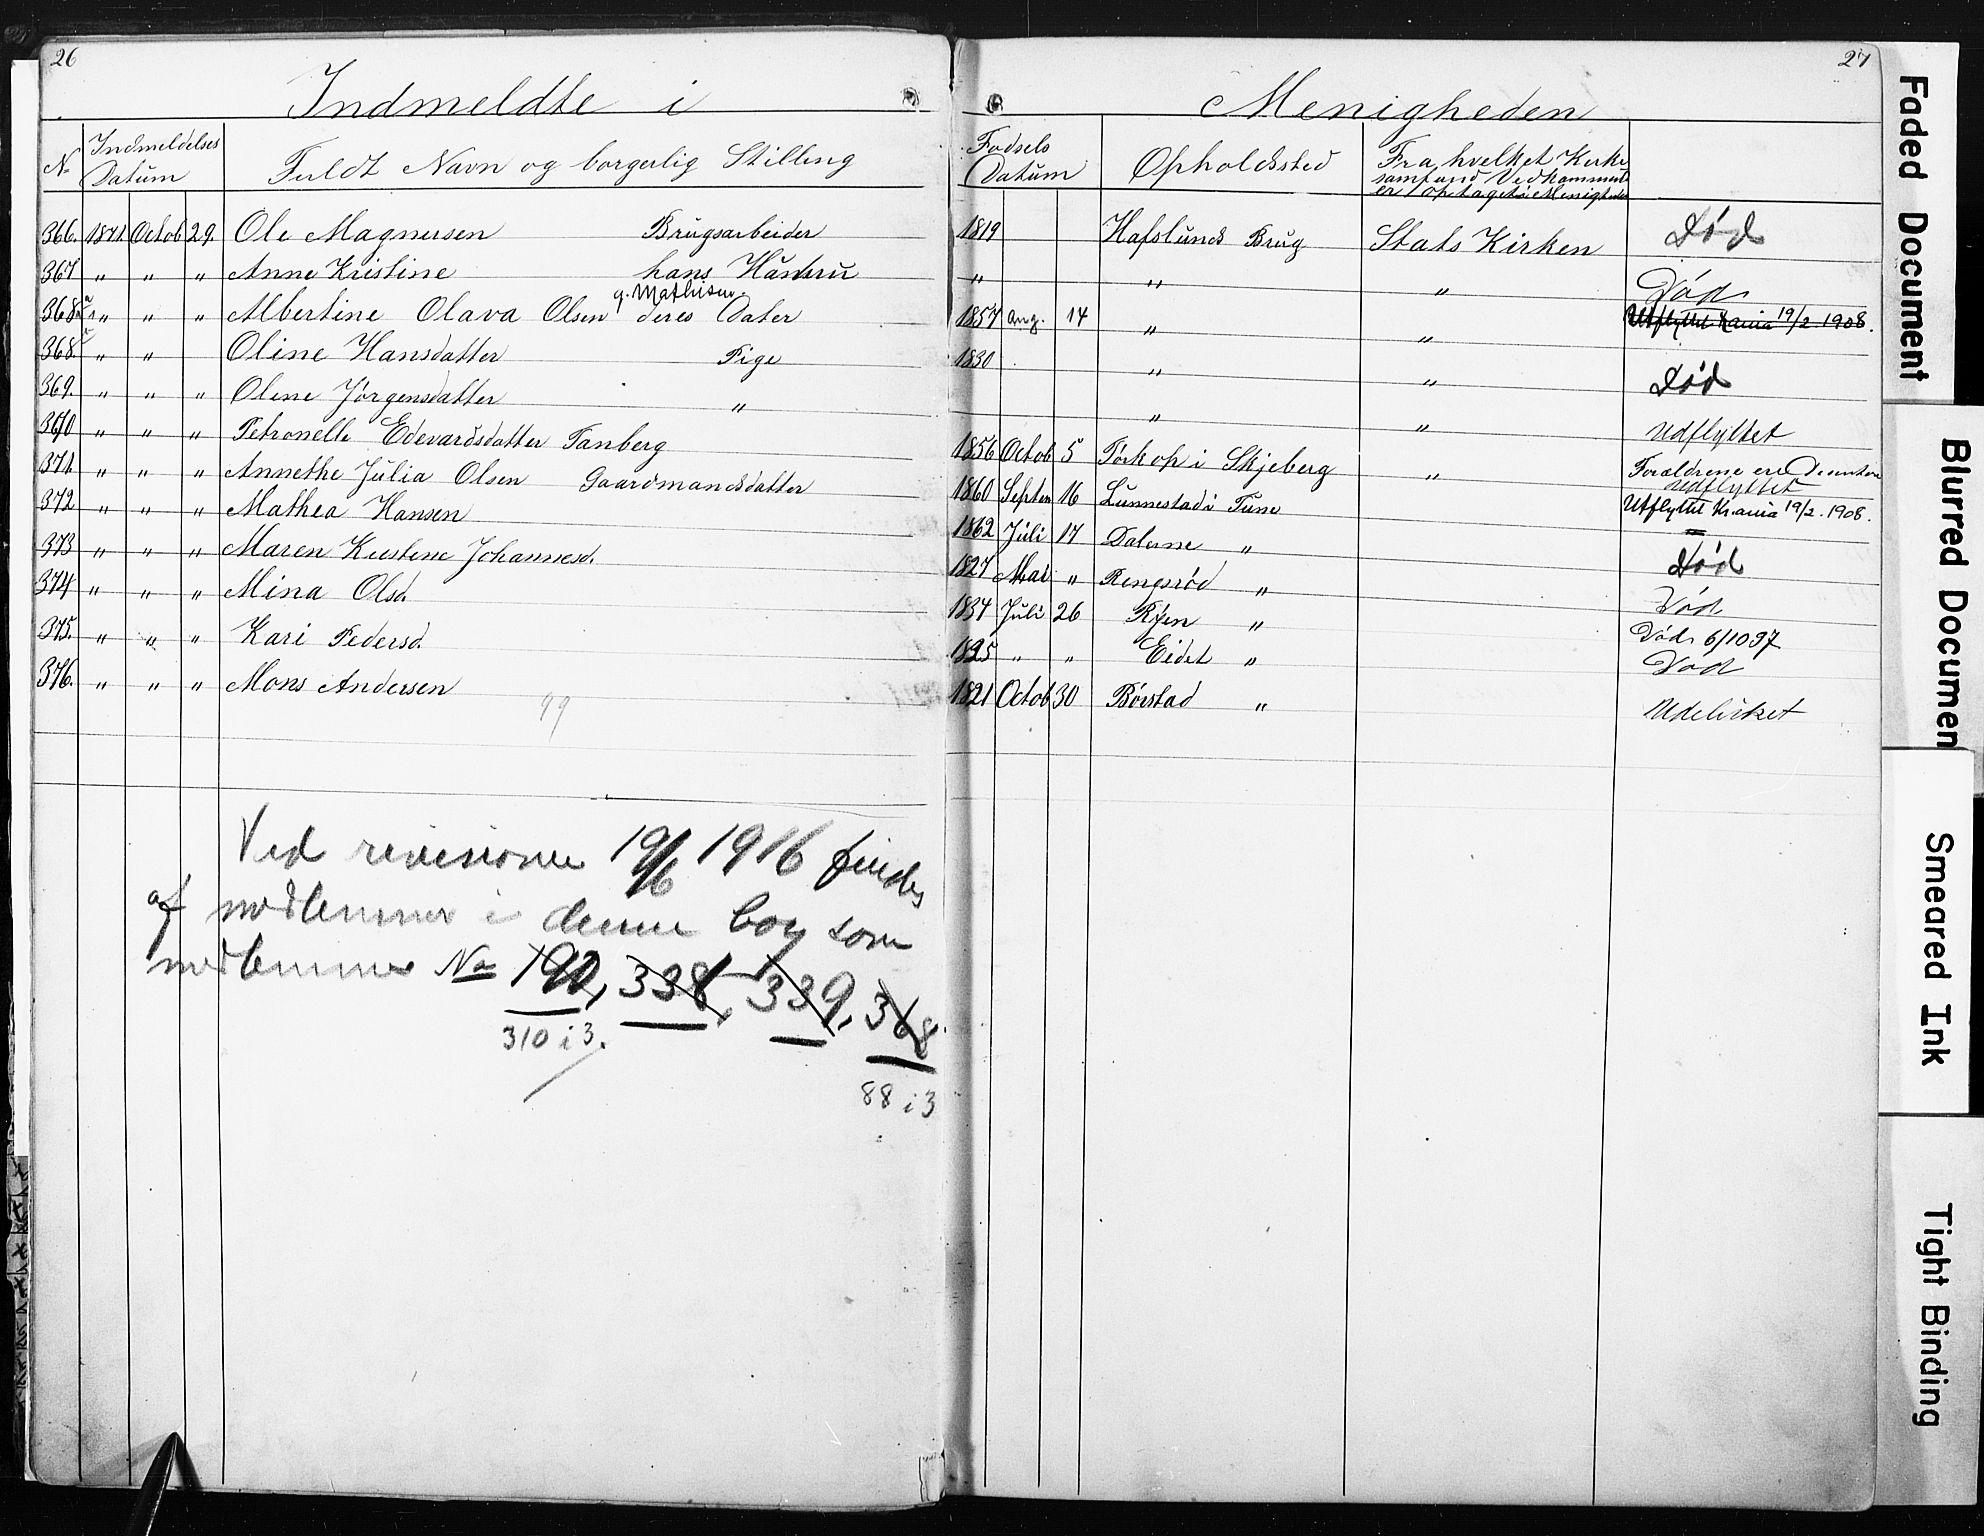 SAO, Sarpsborg metodistkirke, A/L0001: Dissenterprotokoll nr. 1, 1856-1875, s. 26-27